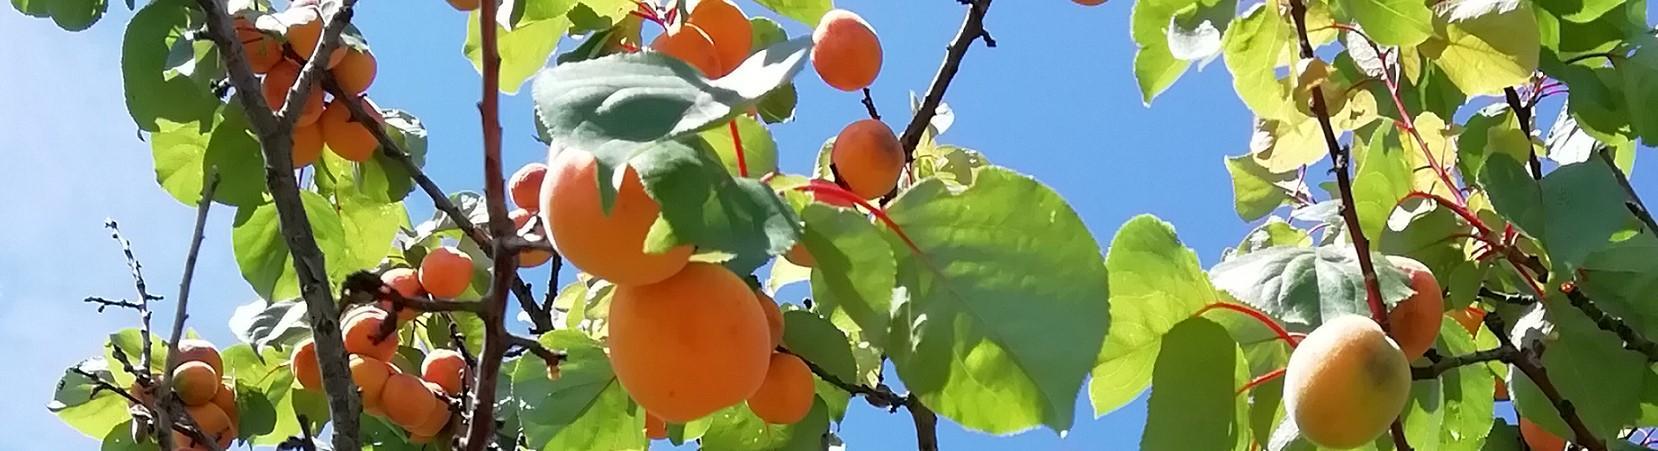 Bandeau abricot uz